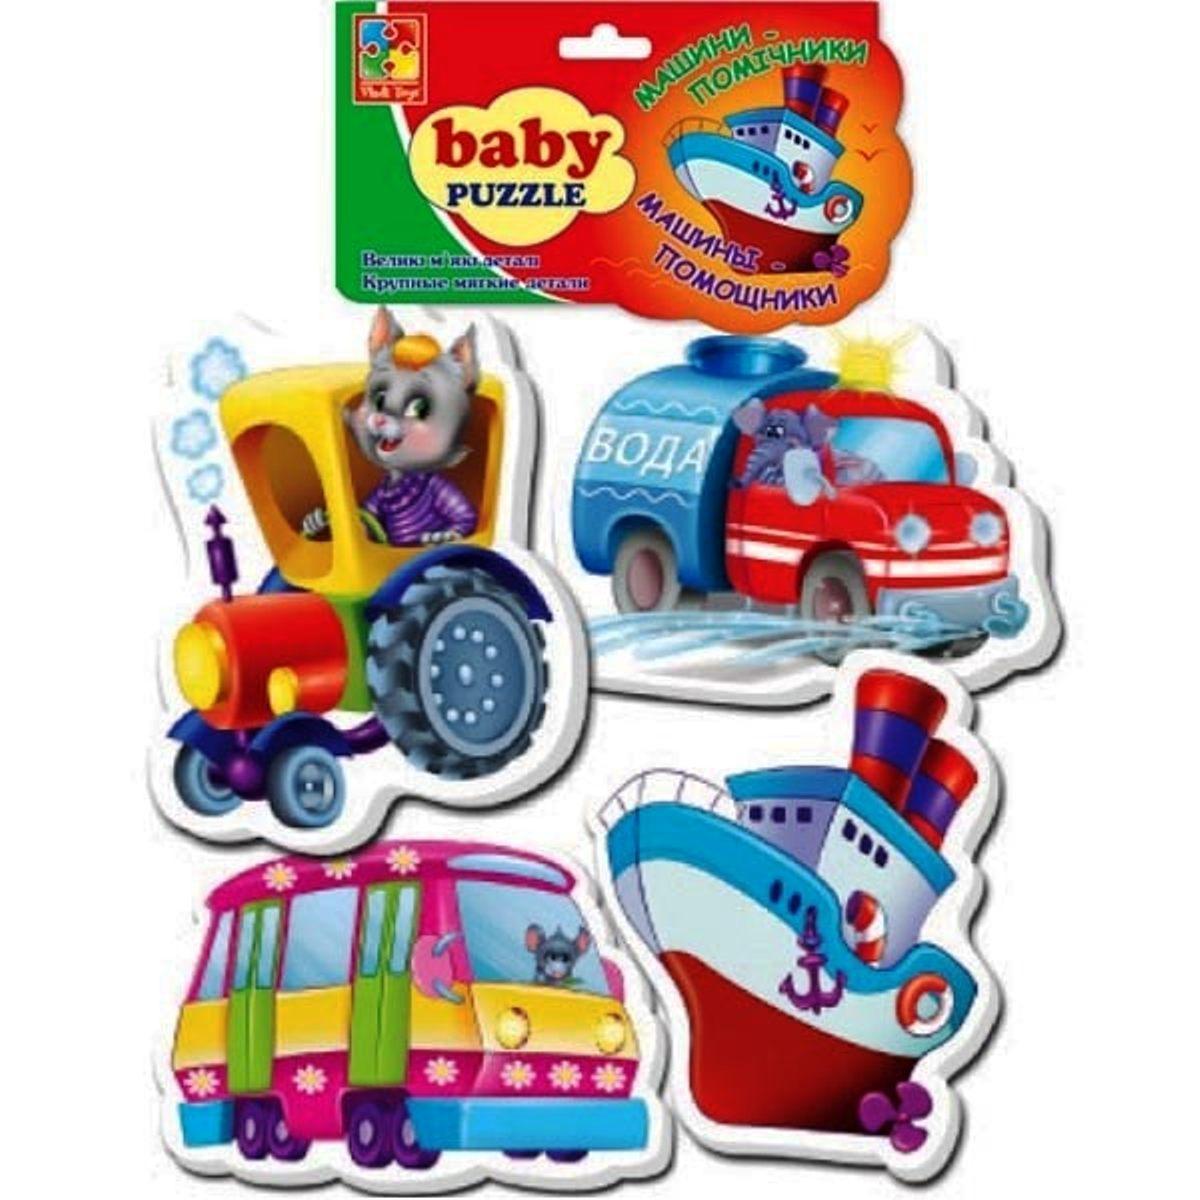 Мягкие пазлы для малышей Транспорт (рус/укр), Vladi Toys (VT1106-08)